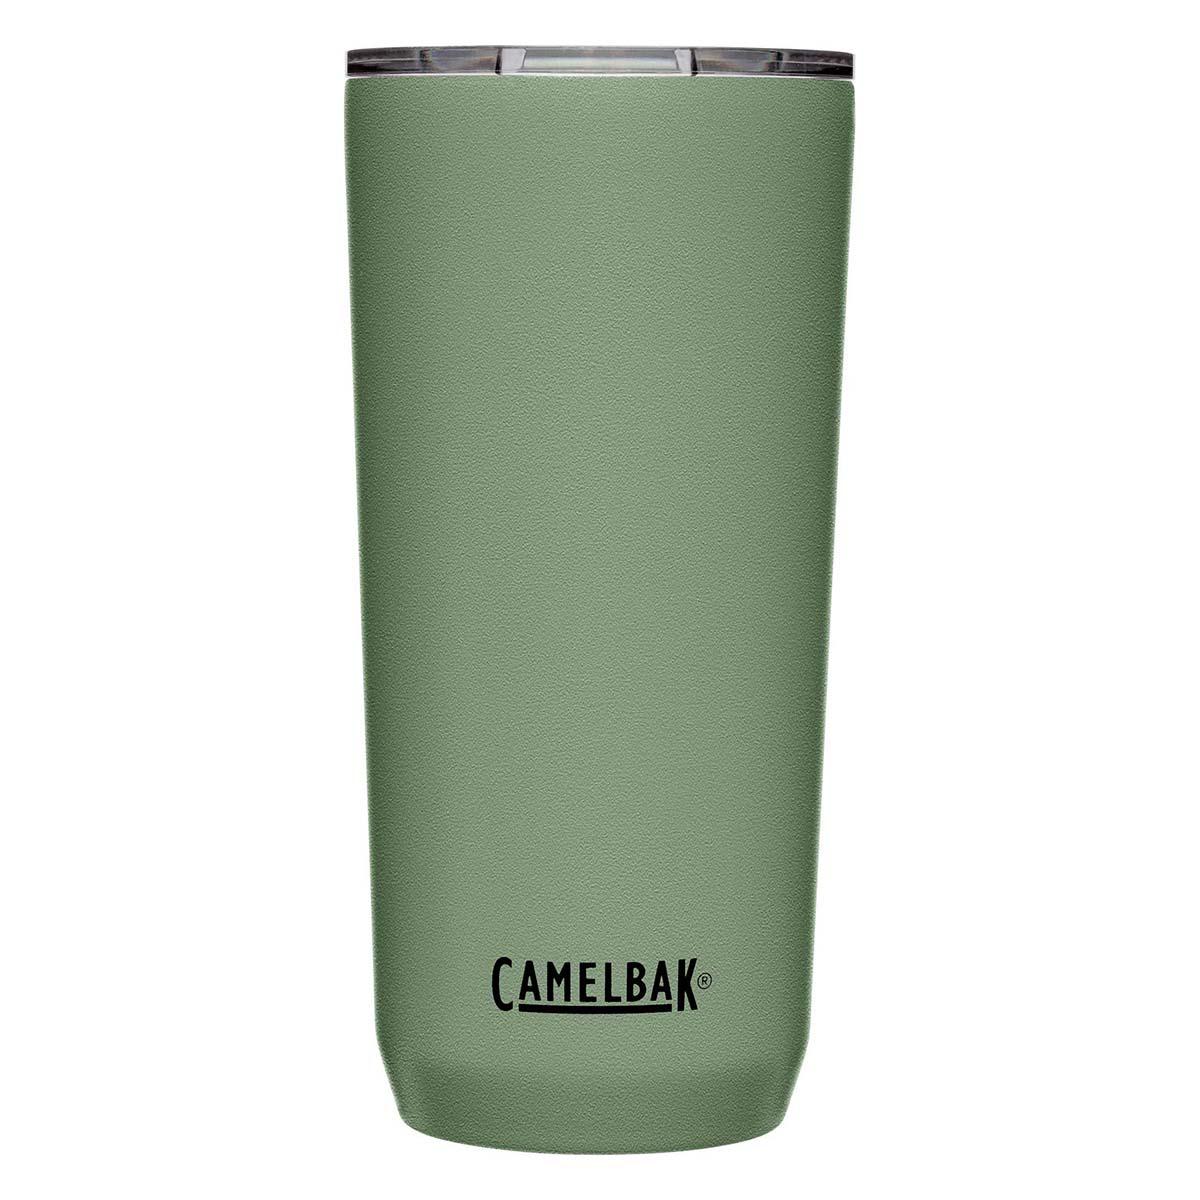 Camelbak – Horizon 20 OZ Tumbler